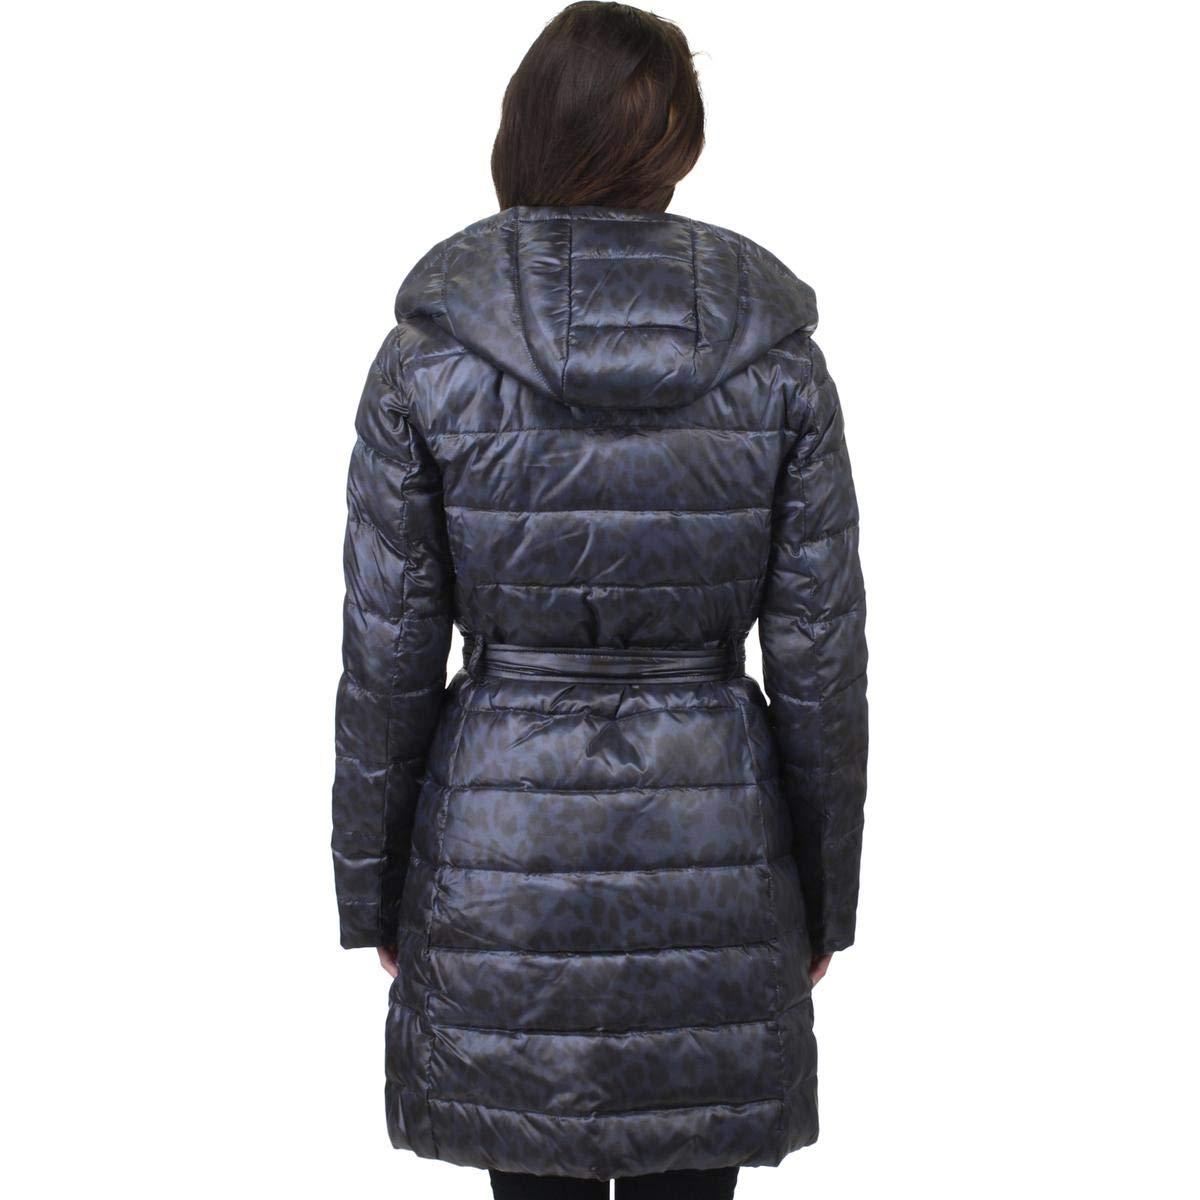 e72d66acdc22 ELLEN TRACY Women s Leopard Print Long Hooded Faux Down Winter Coat Jacket  at Amazon Women s Coats Shop